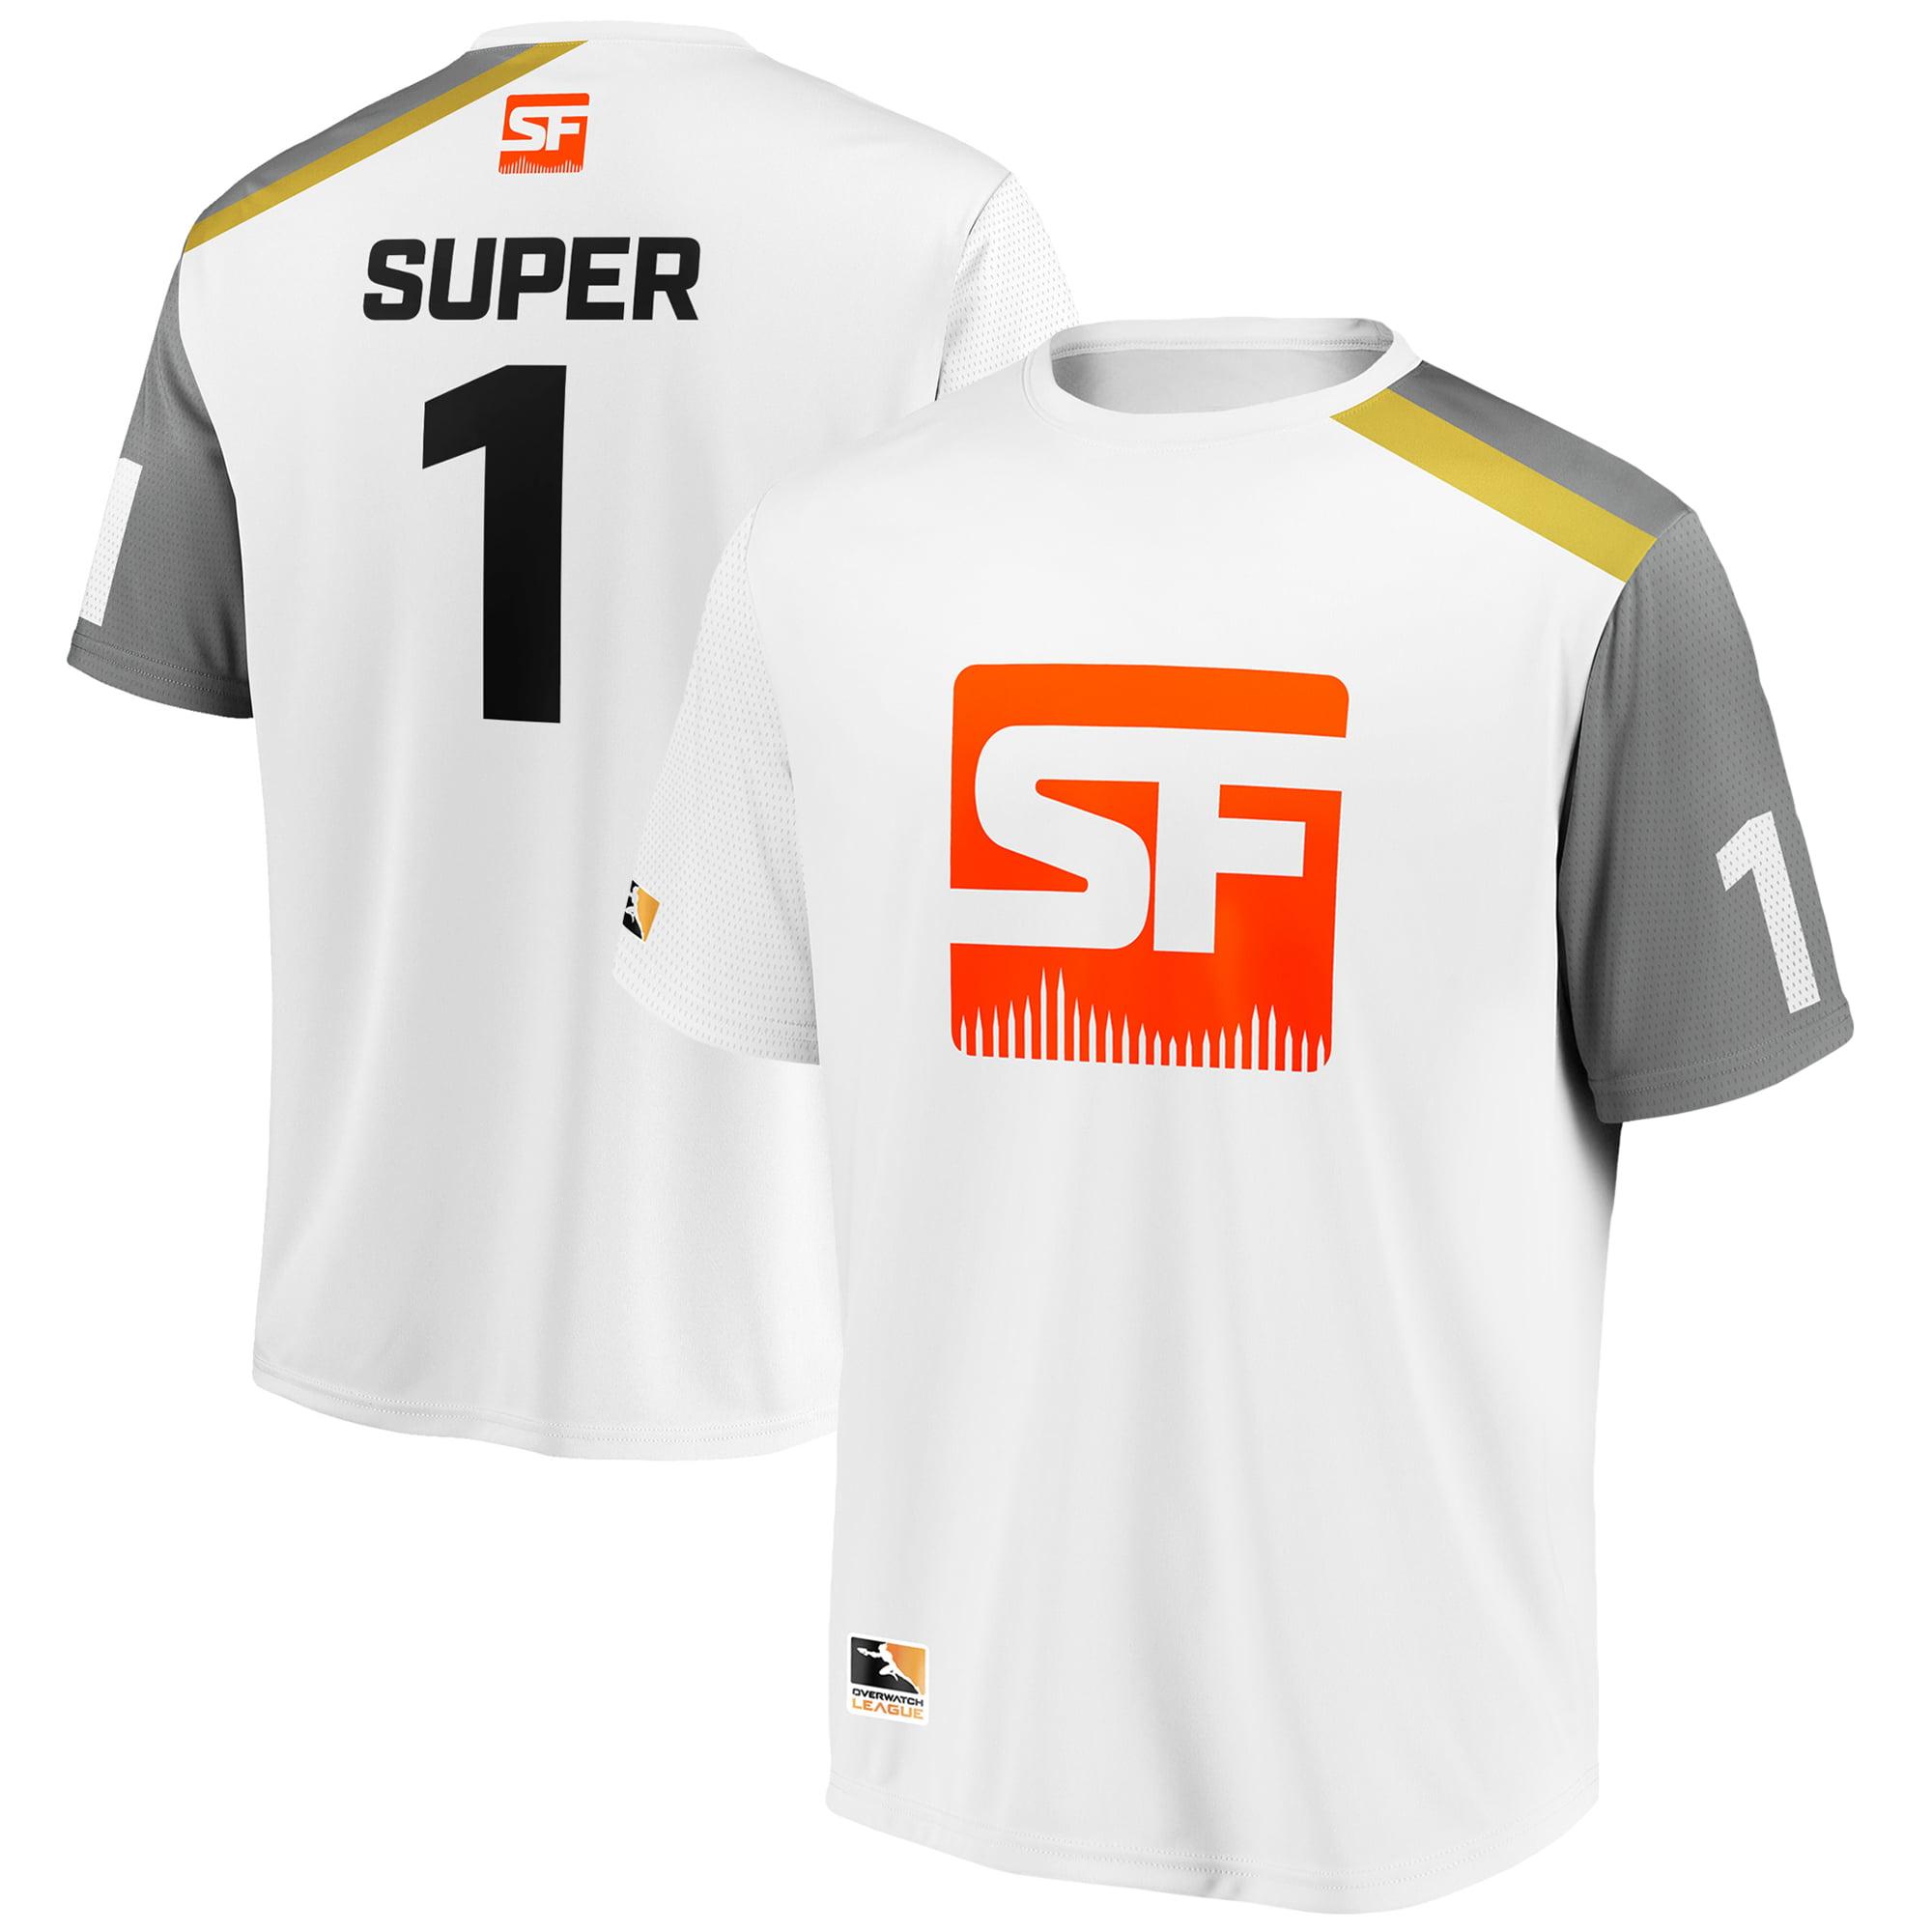 super San Francisco Shock Overwatch League Replica Away Jersey - White